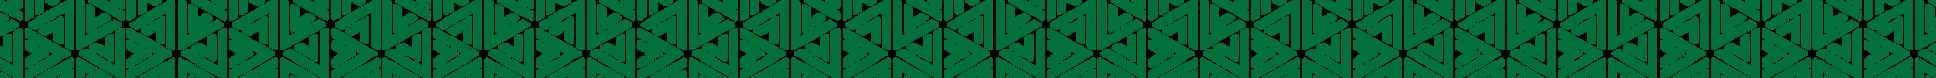 jfi_web_patterns_1895x75_Arrows-02703B.p